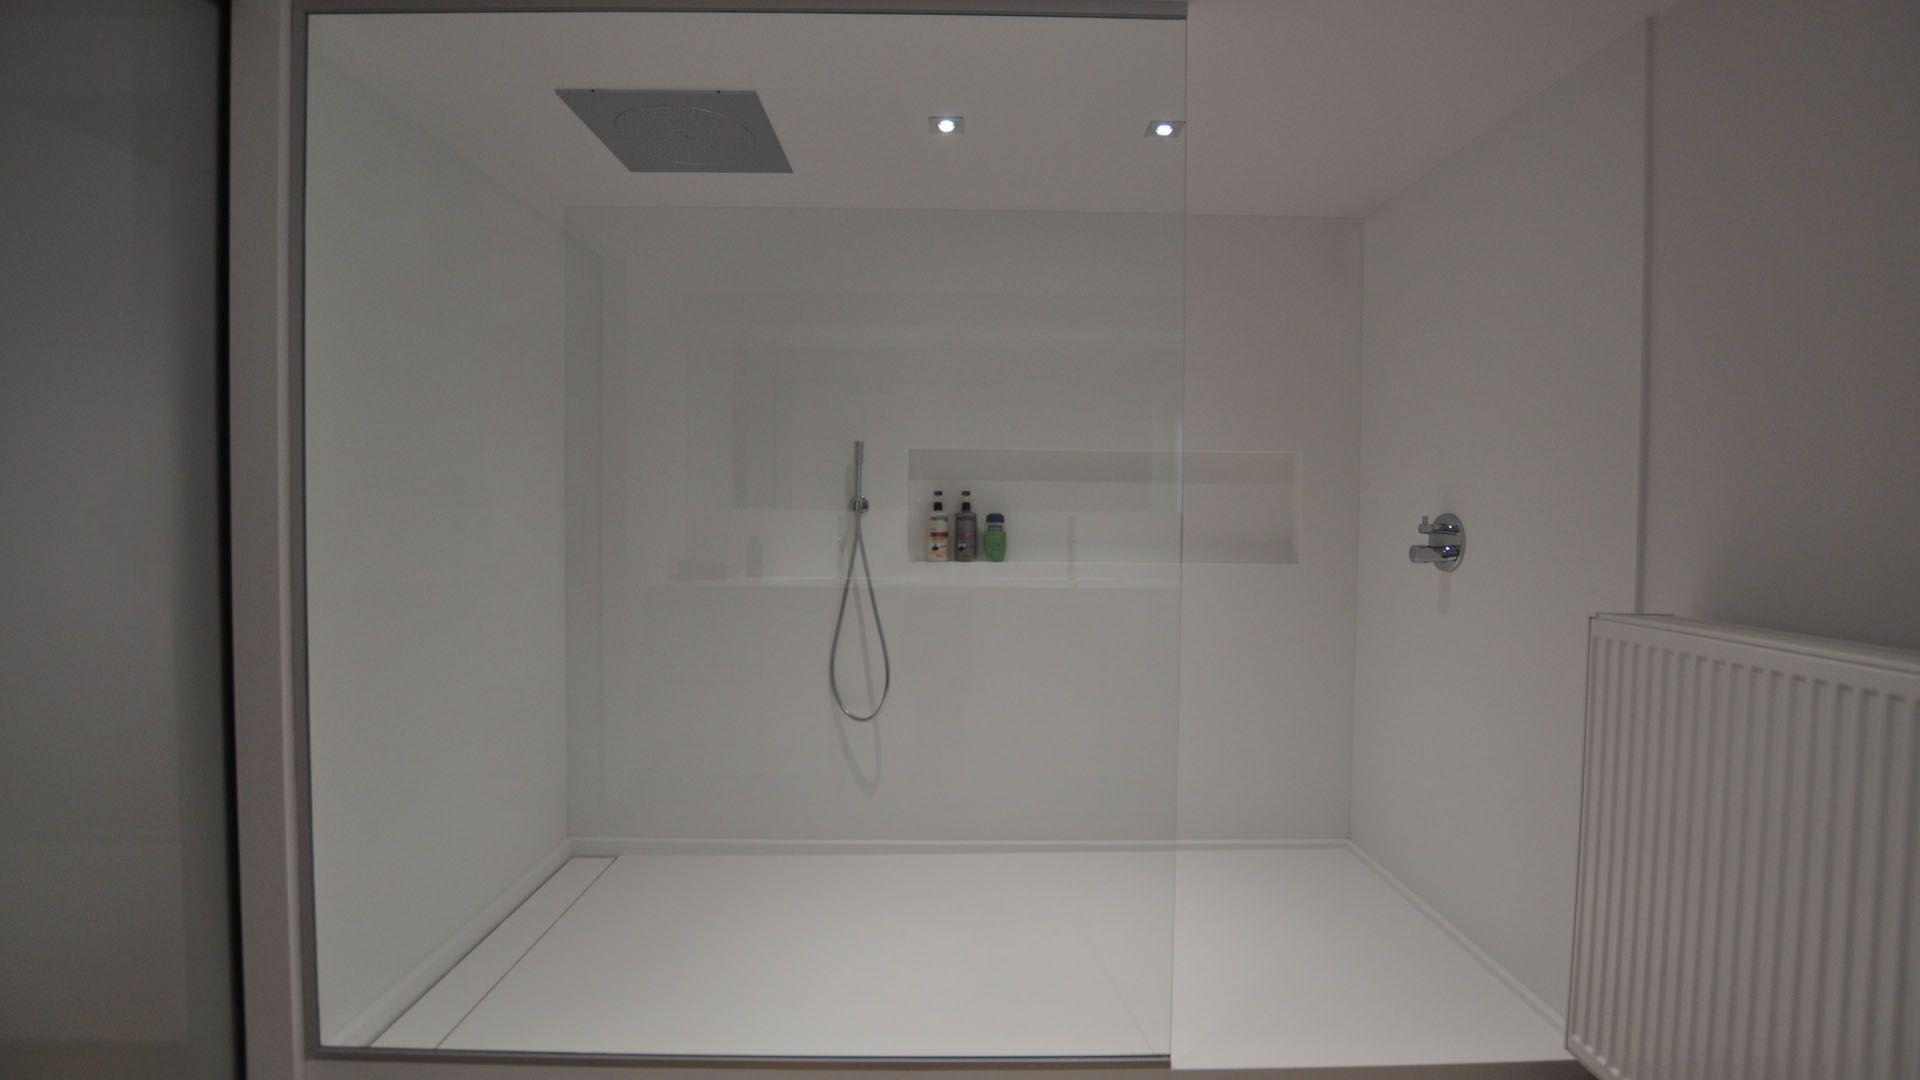 Afzuiging Badkamer Gamma : Mozaiek tegels badkamer gamma gamma tegels badkamer